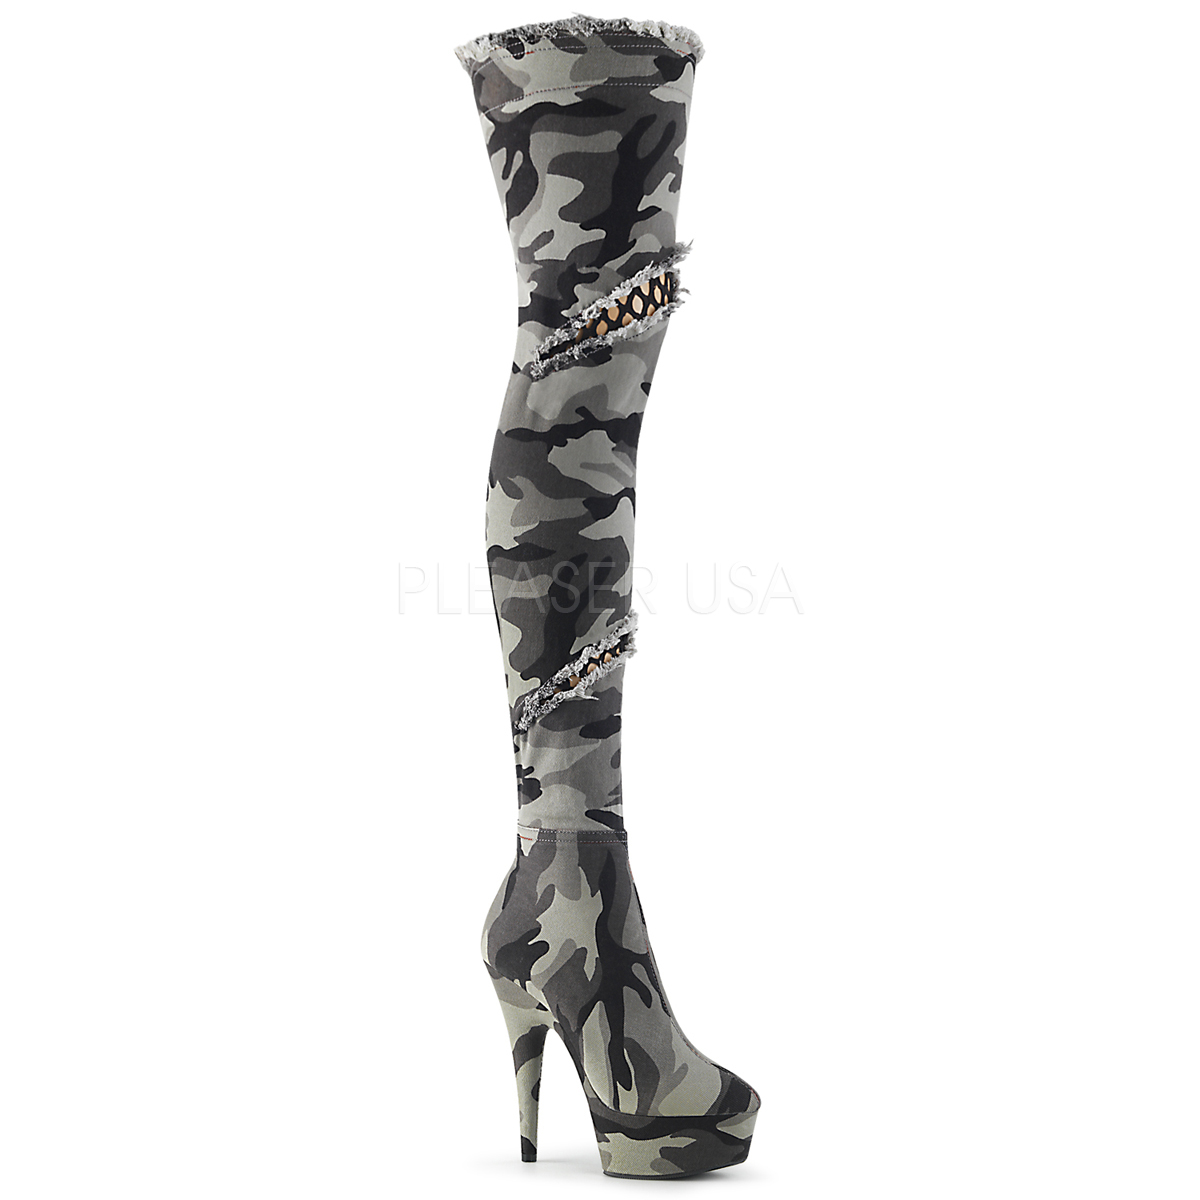 cm Overknee 3005 støvler DELIGHT canvas 15 med Camoflash høj hæl tBosdQrCxh